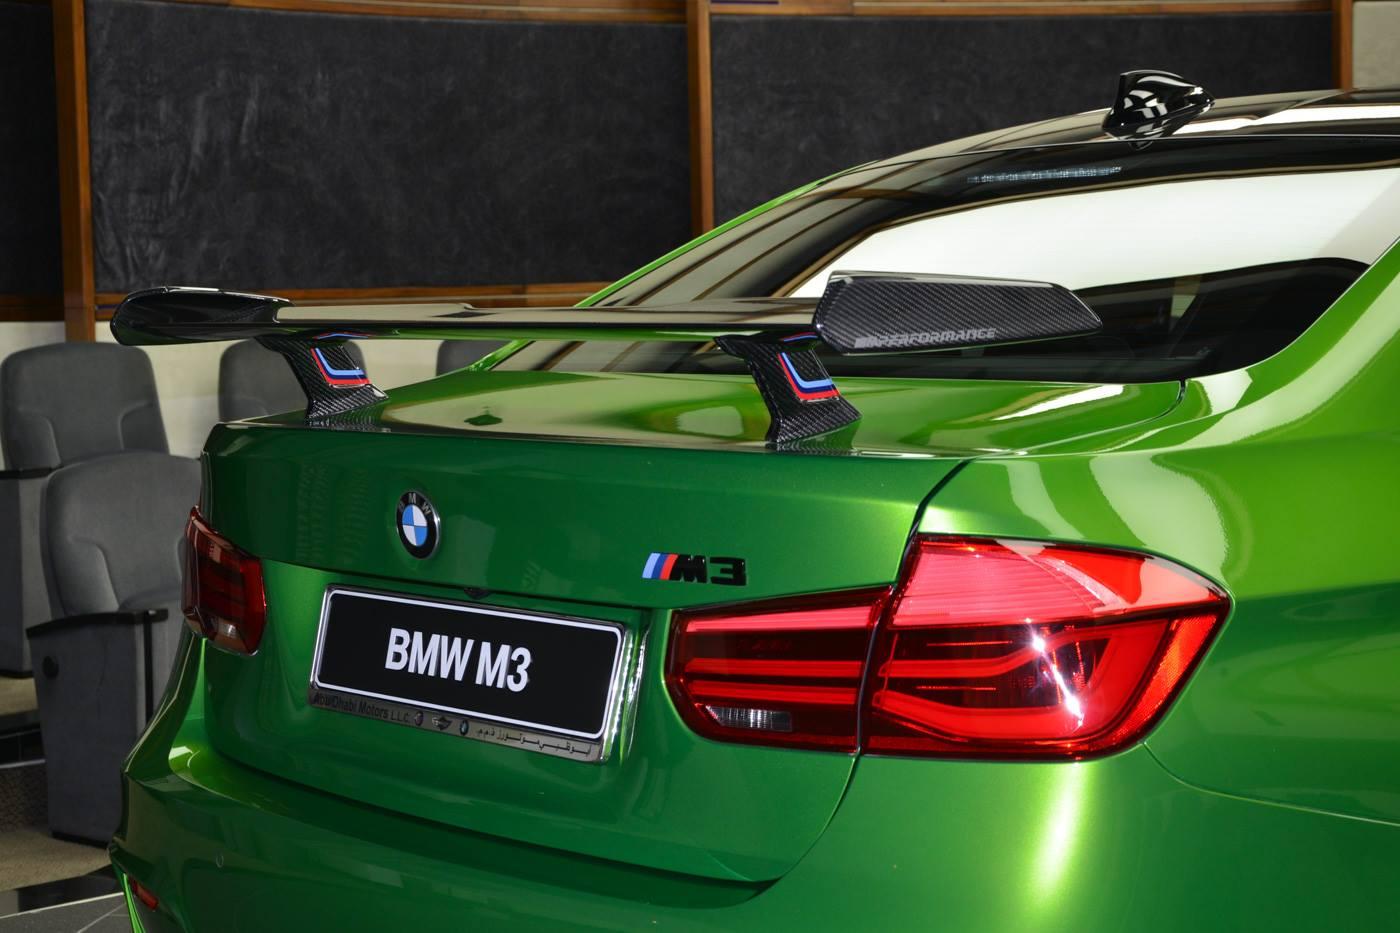 BMW_M3_Java_Green_13